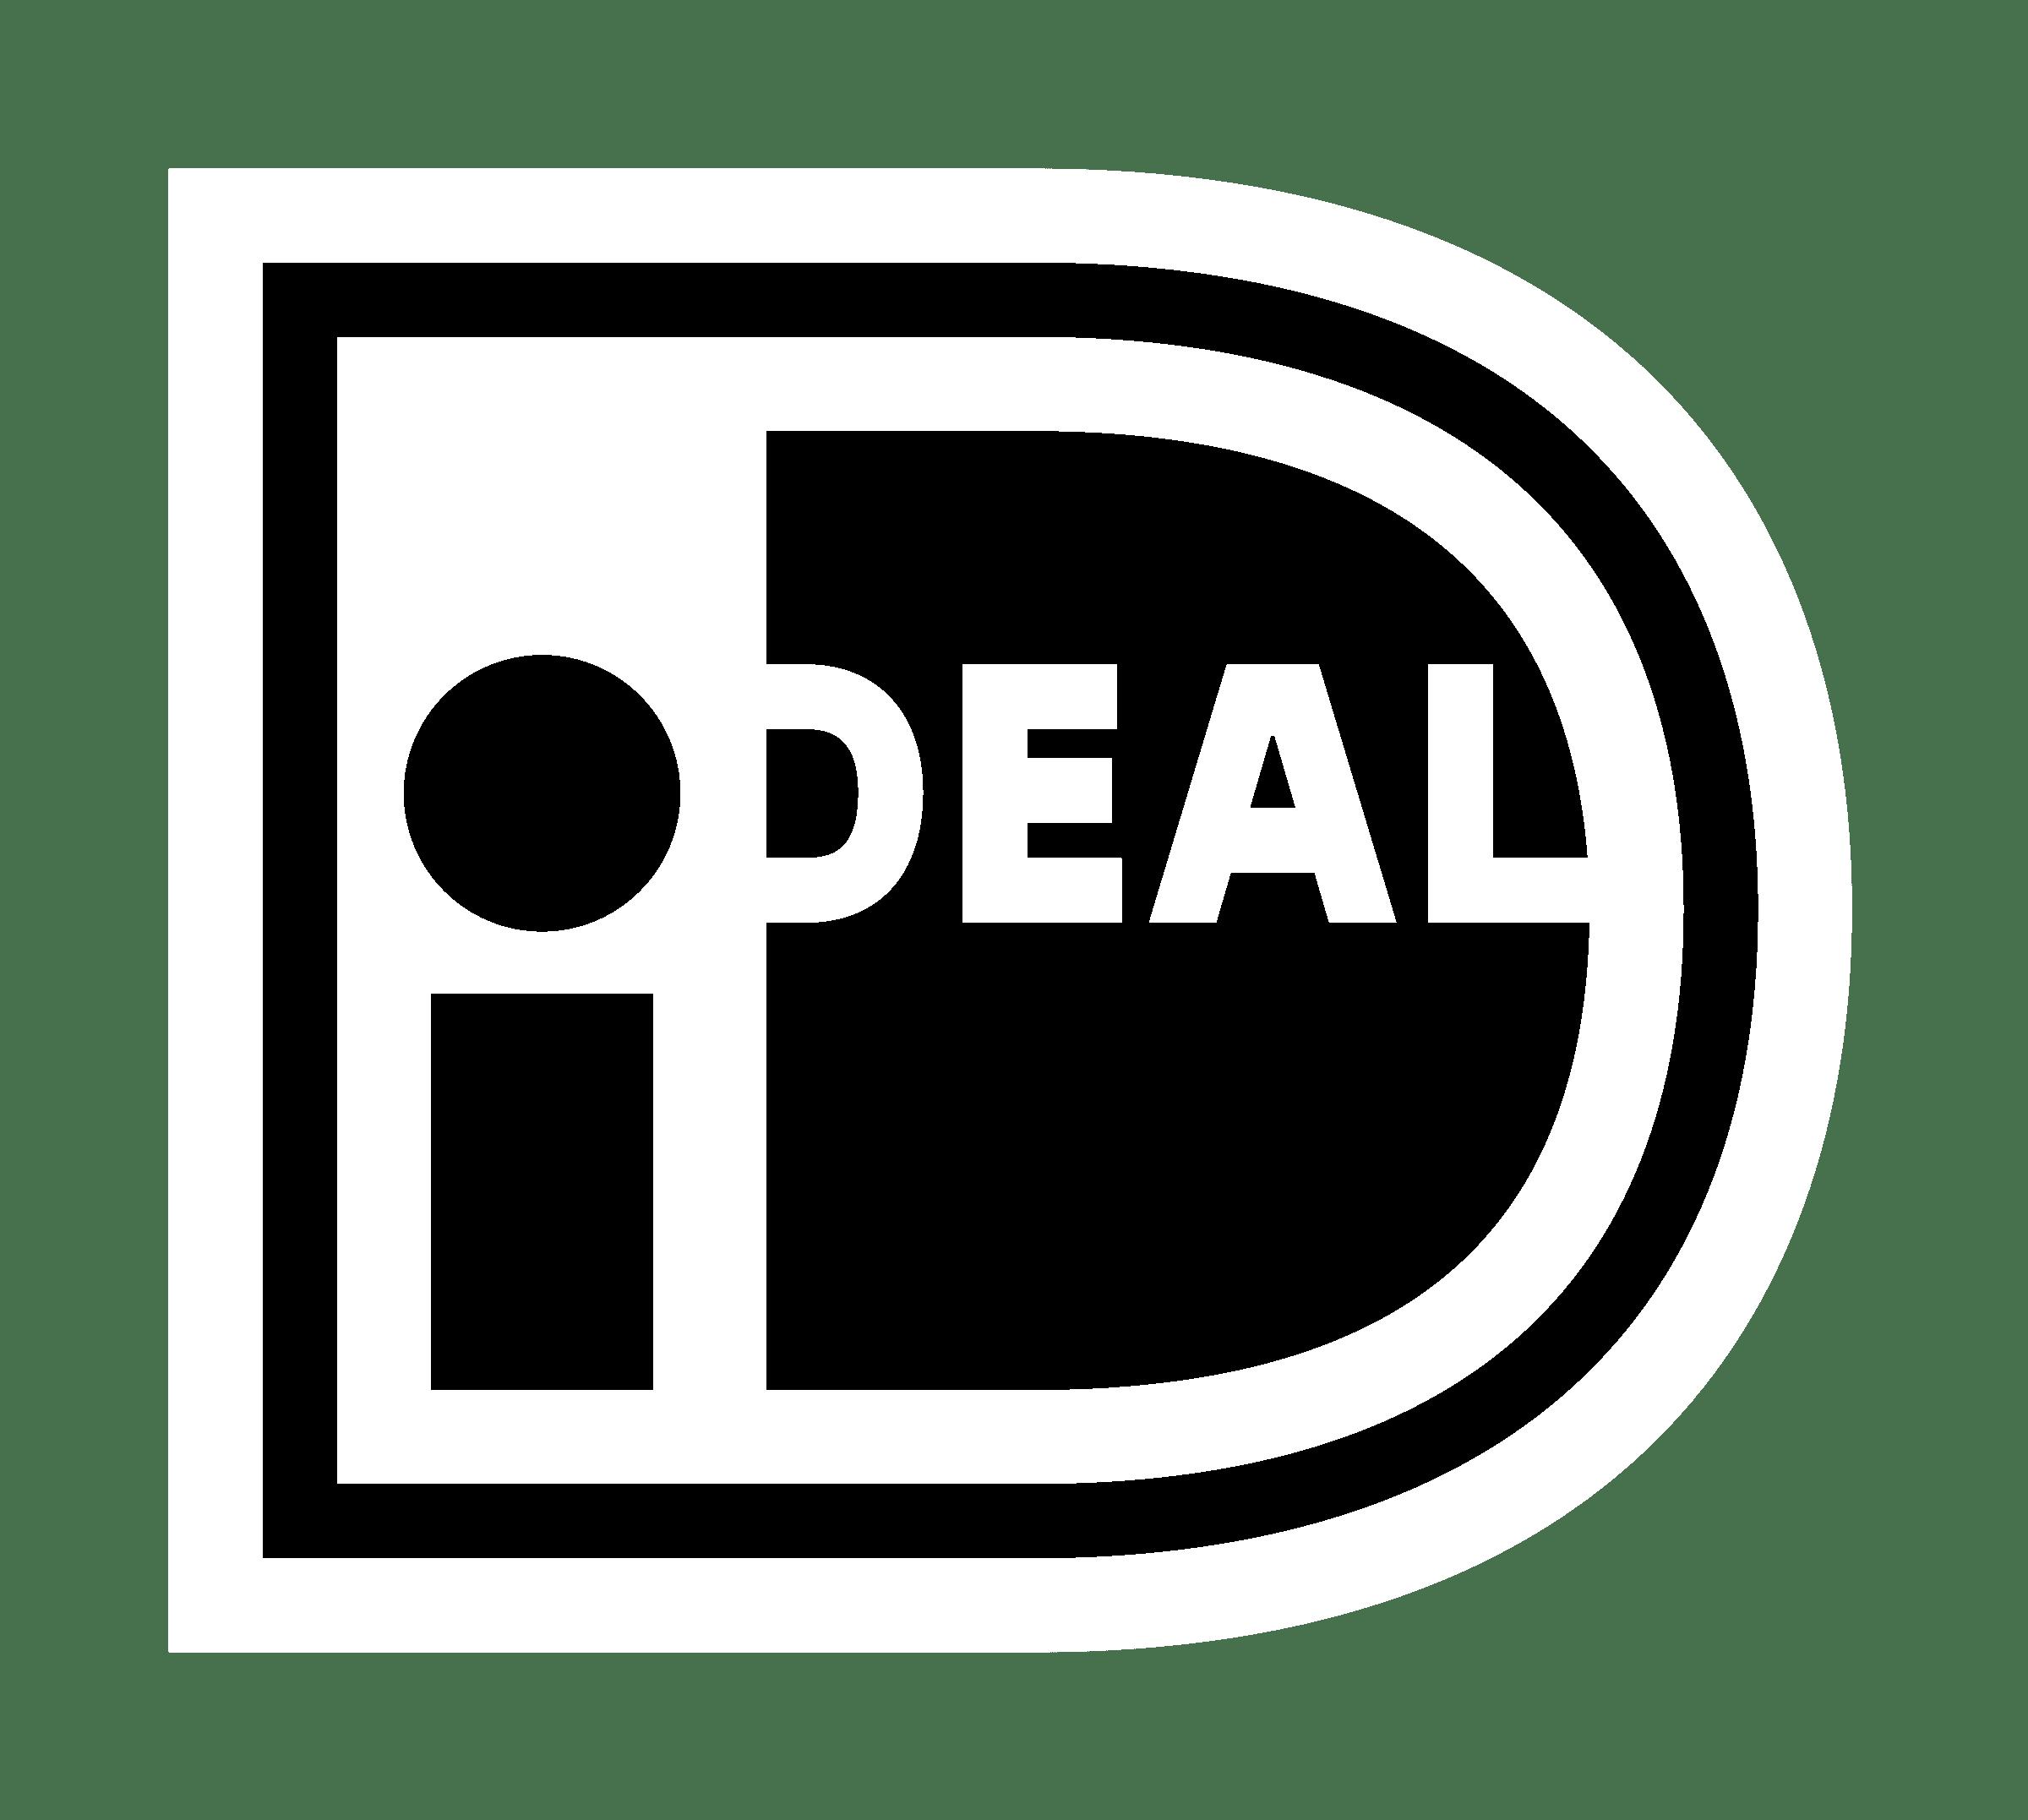 ideal-logo-black